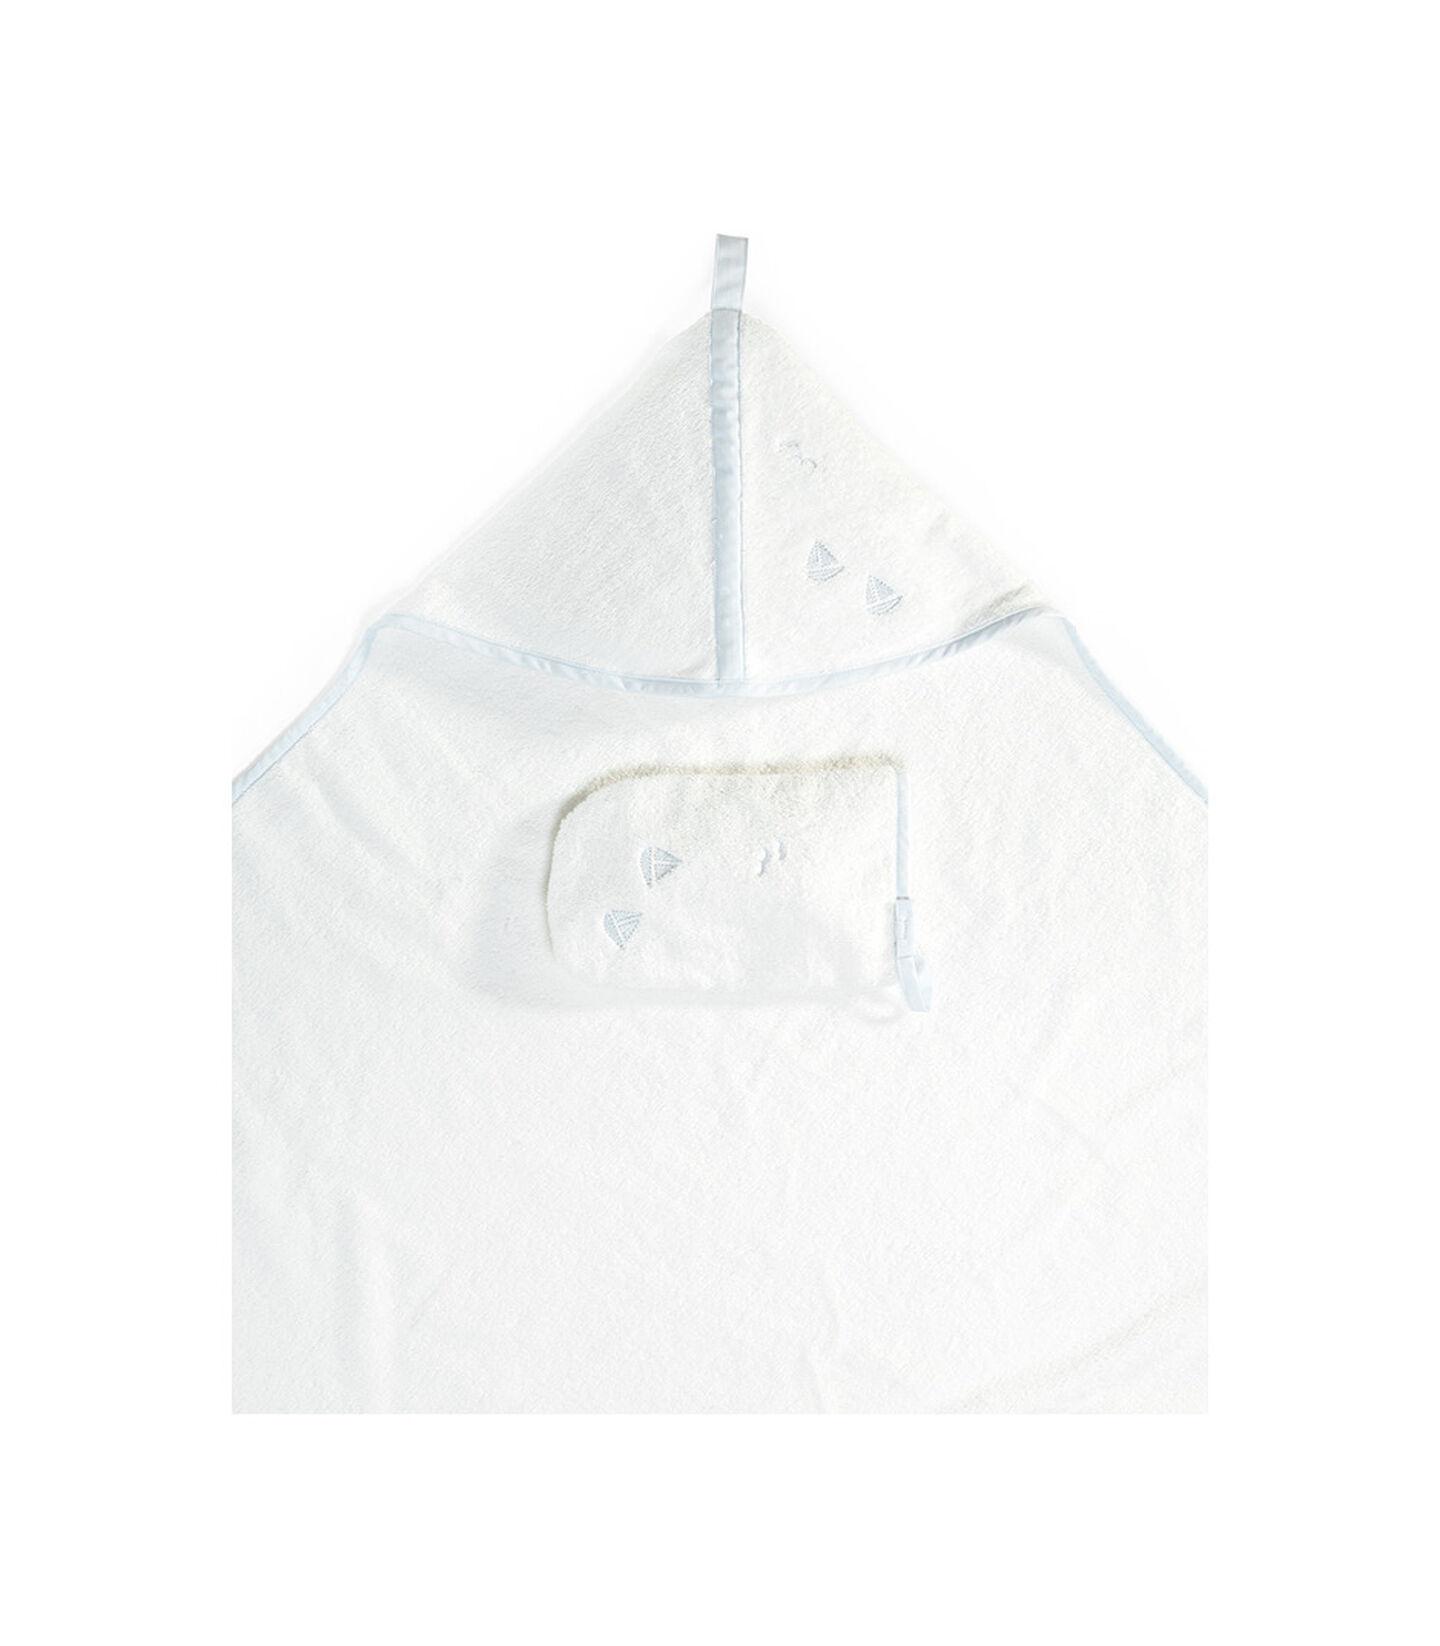 Stokke® Hooded Towel Blue Sea, Bleu océan, mainview view 2